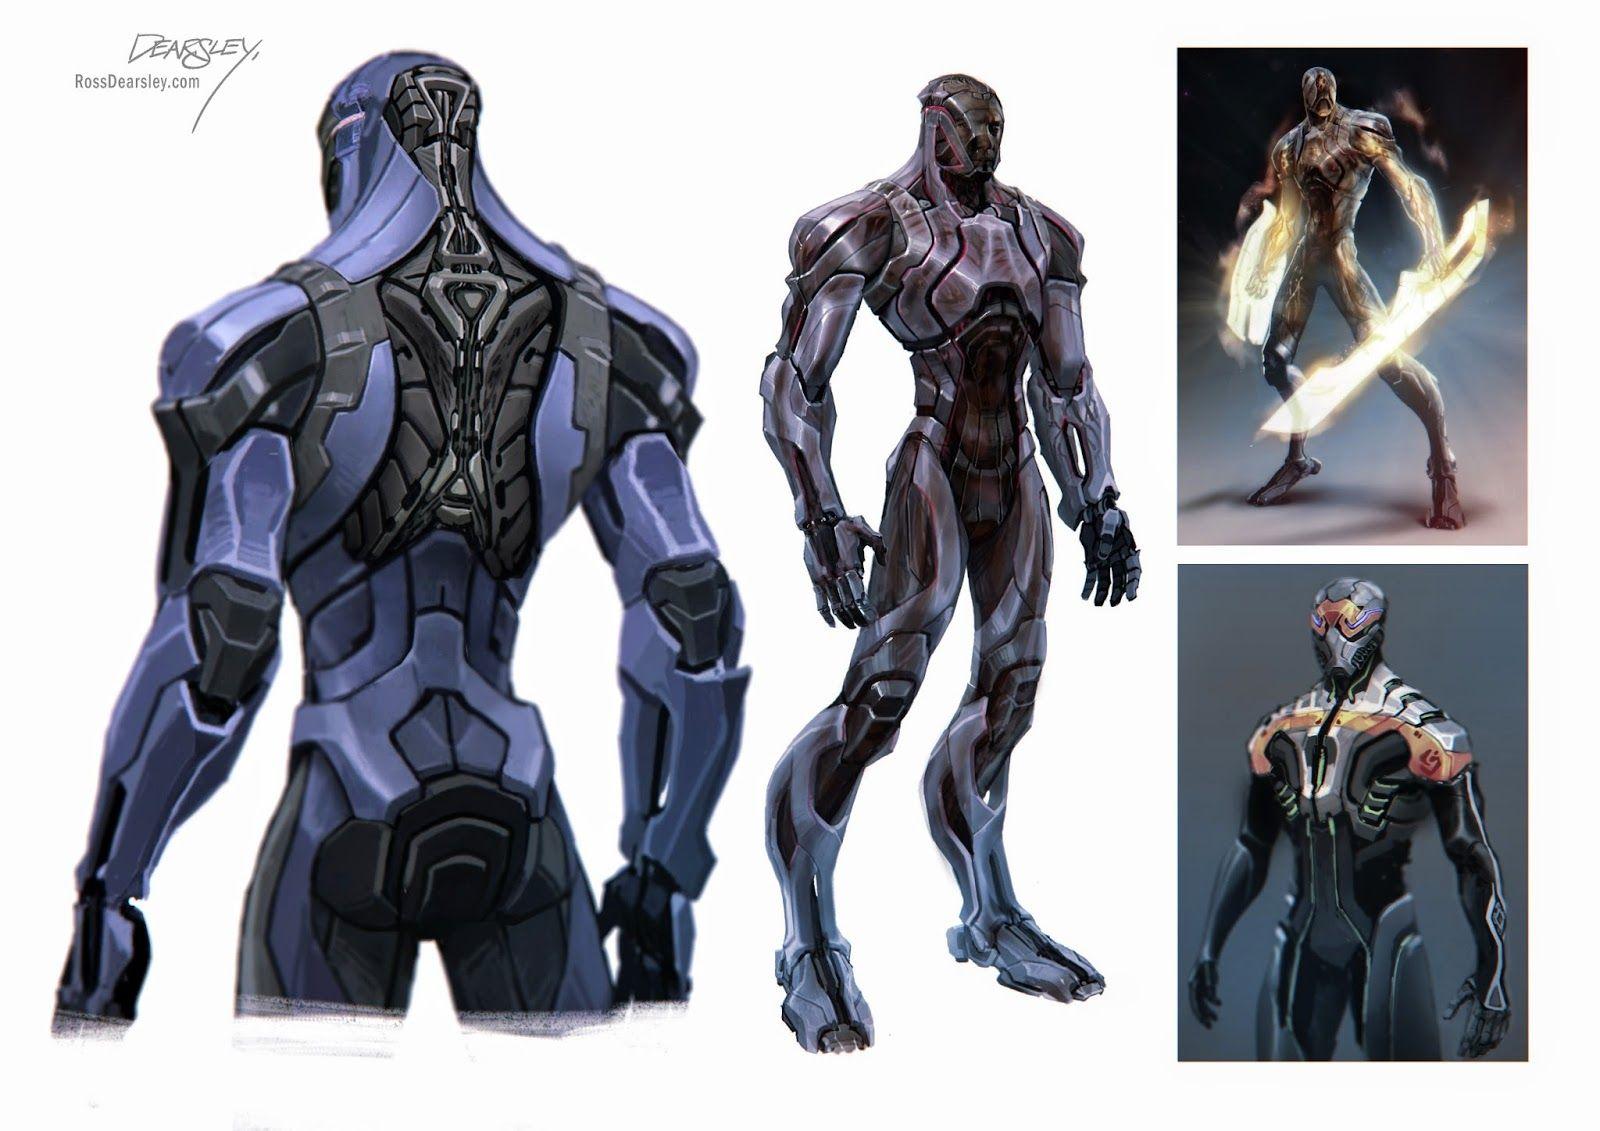 Ross Dearsley Concept Art Characters Armor Concept Superhero Design